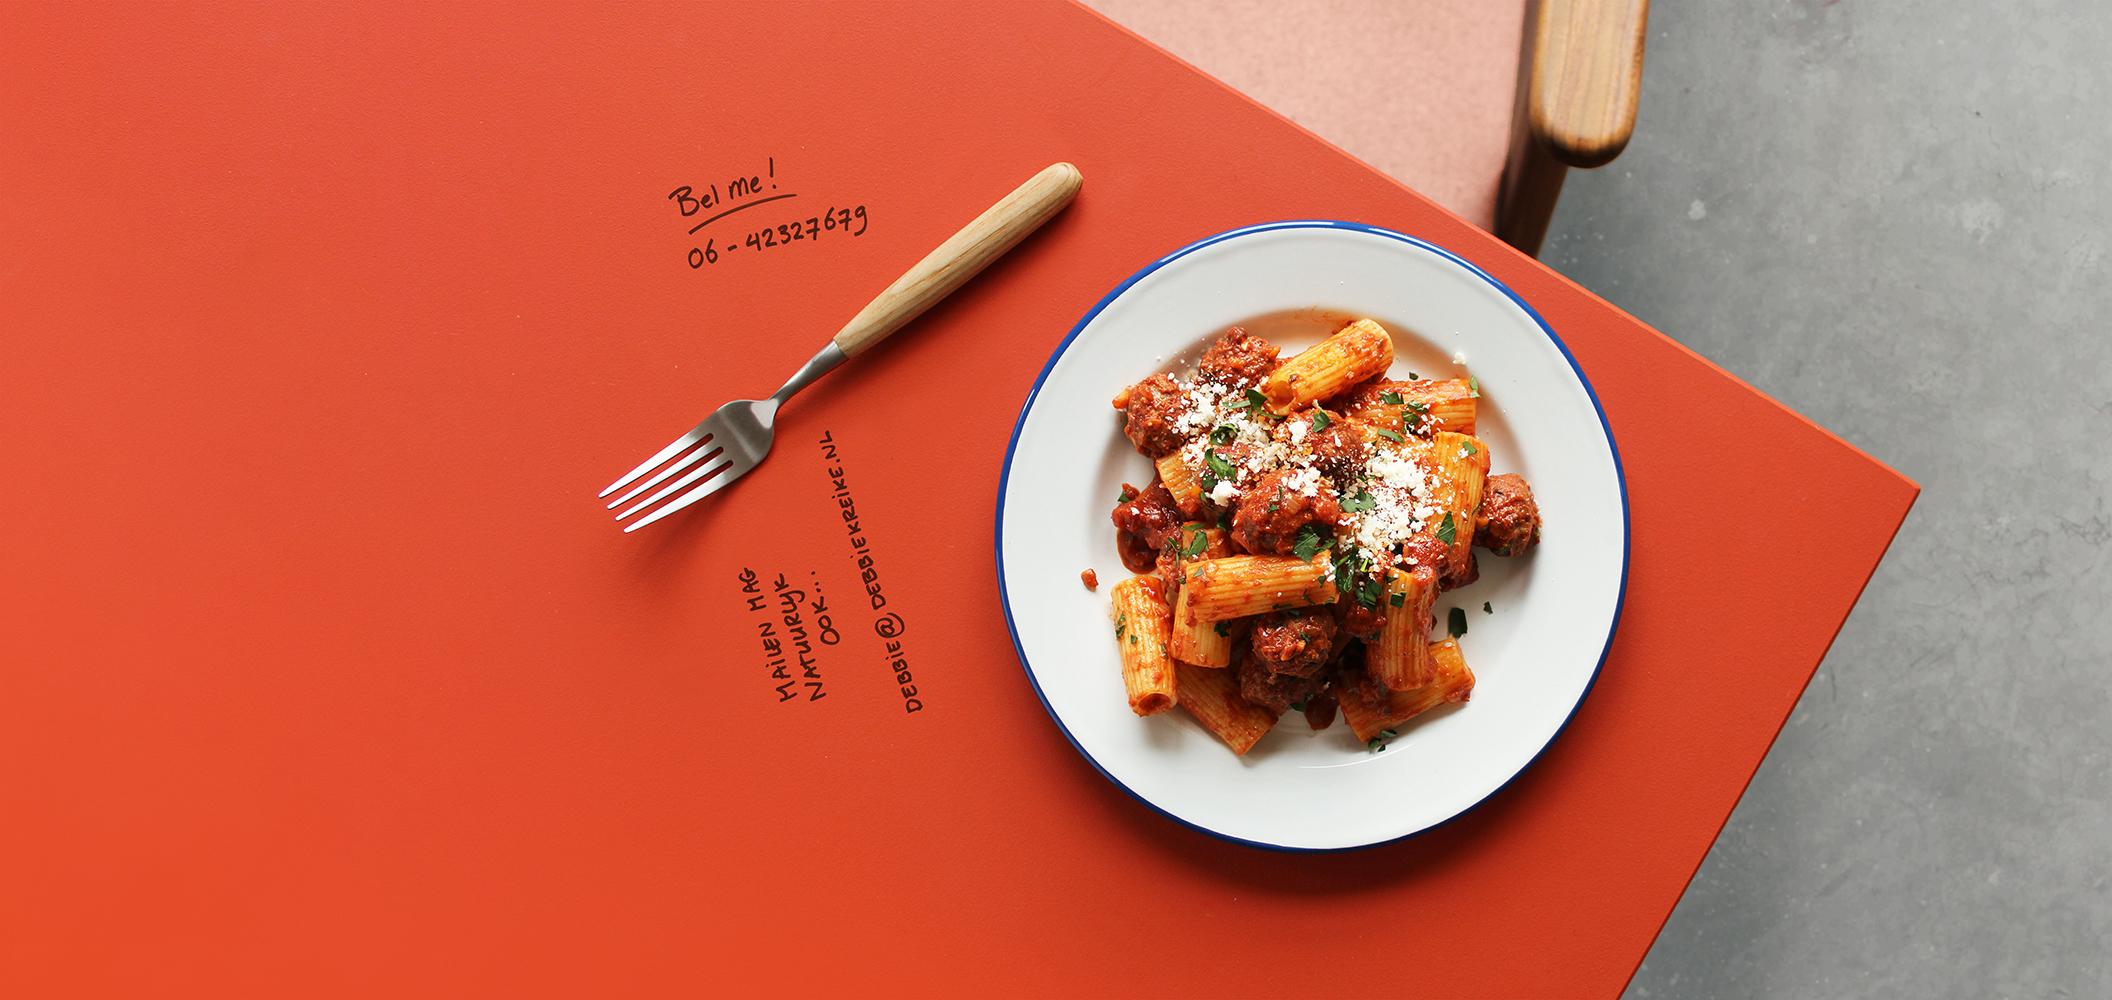 foodstyling rigatoni con polpette gehaktballetjes arrabiata saus Italiaans